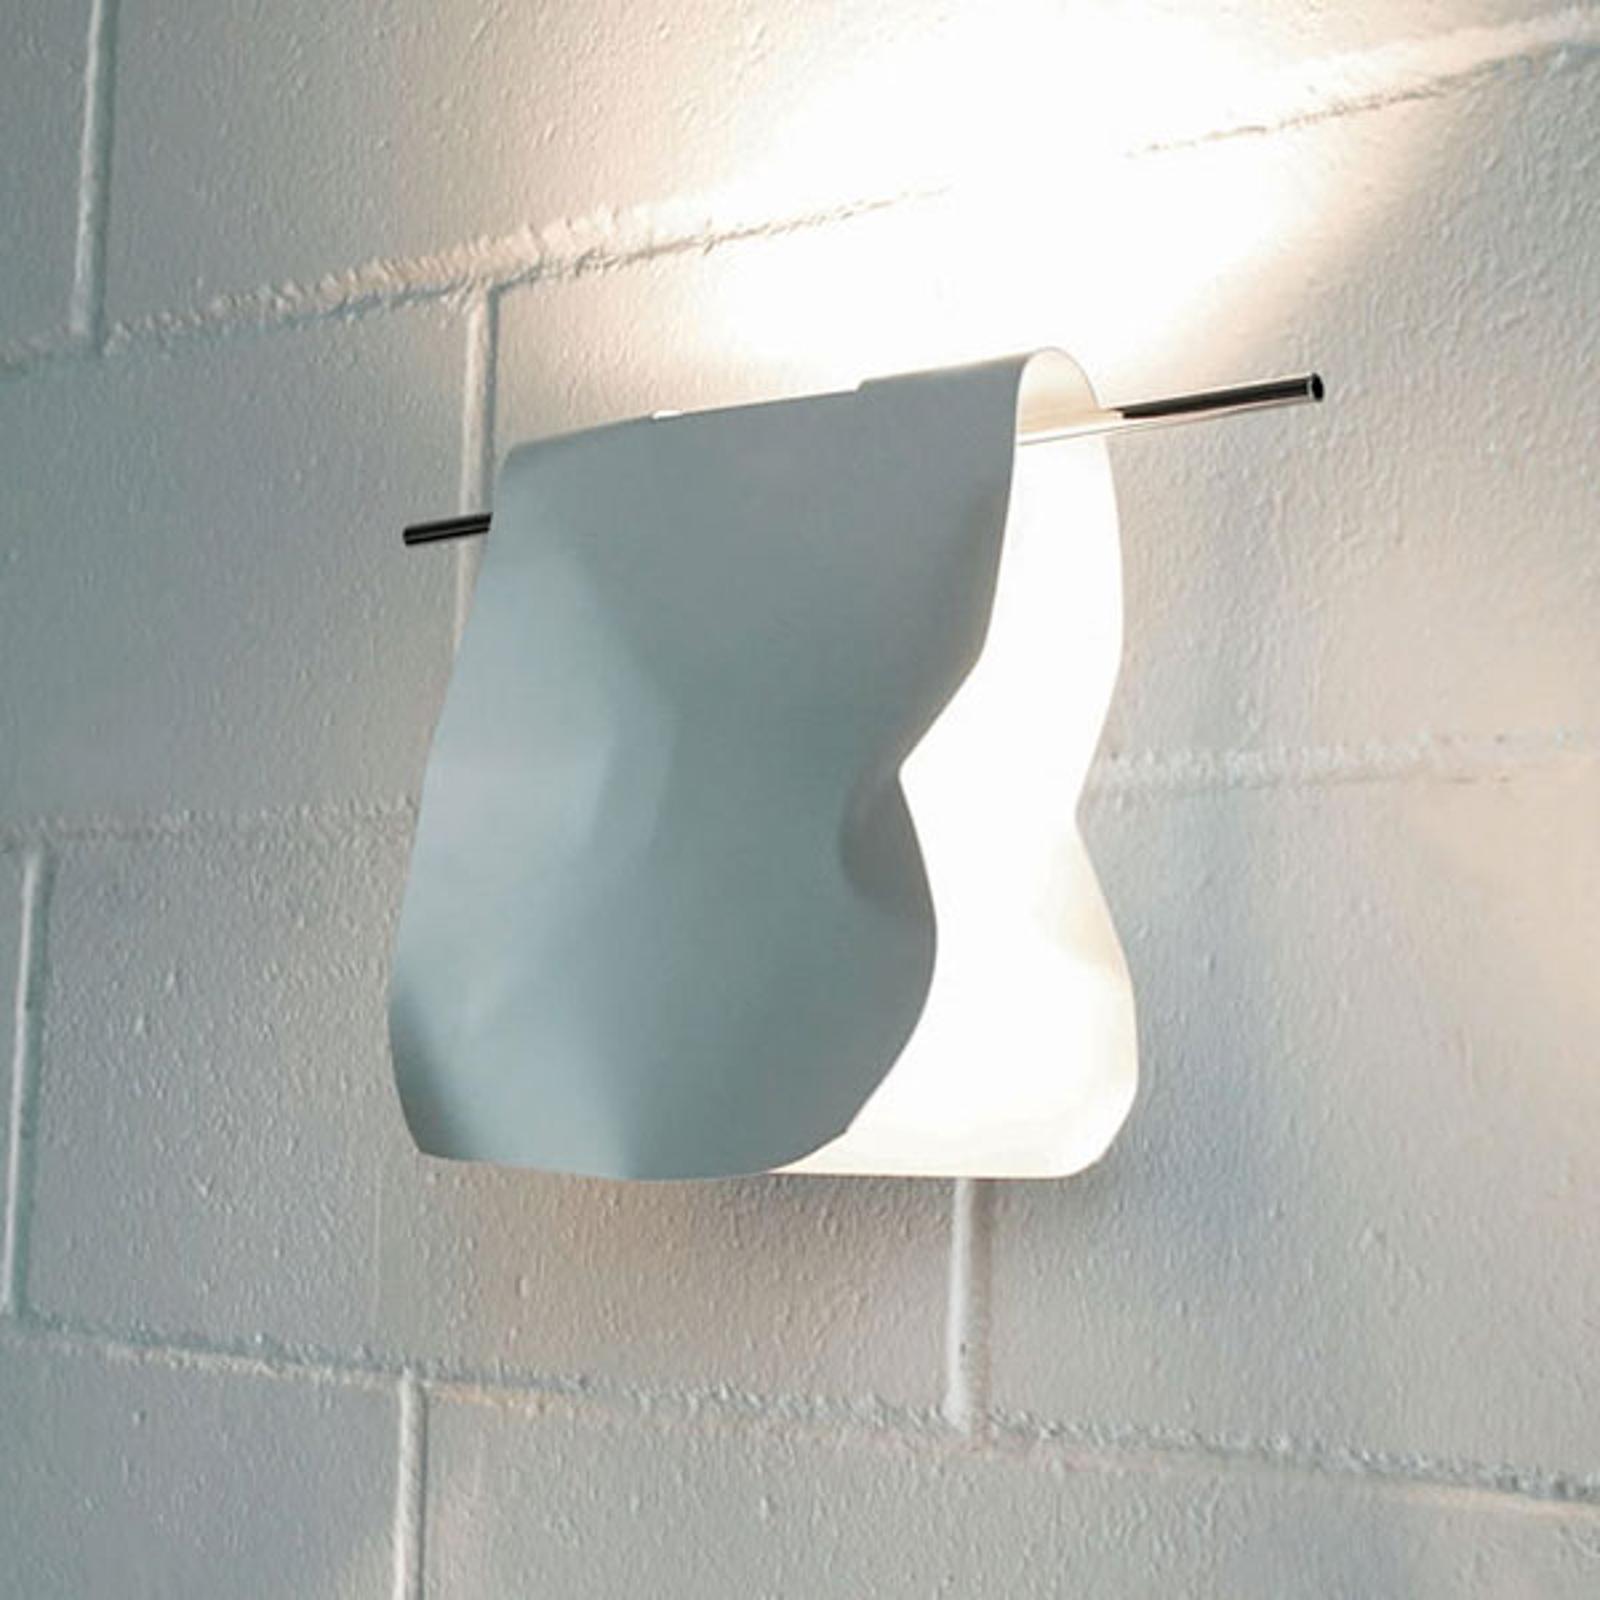 Knikerboker Stendimi - LED wandlamp, wit